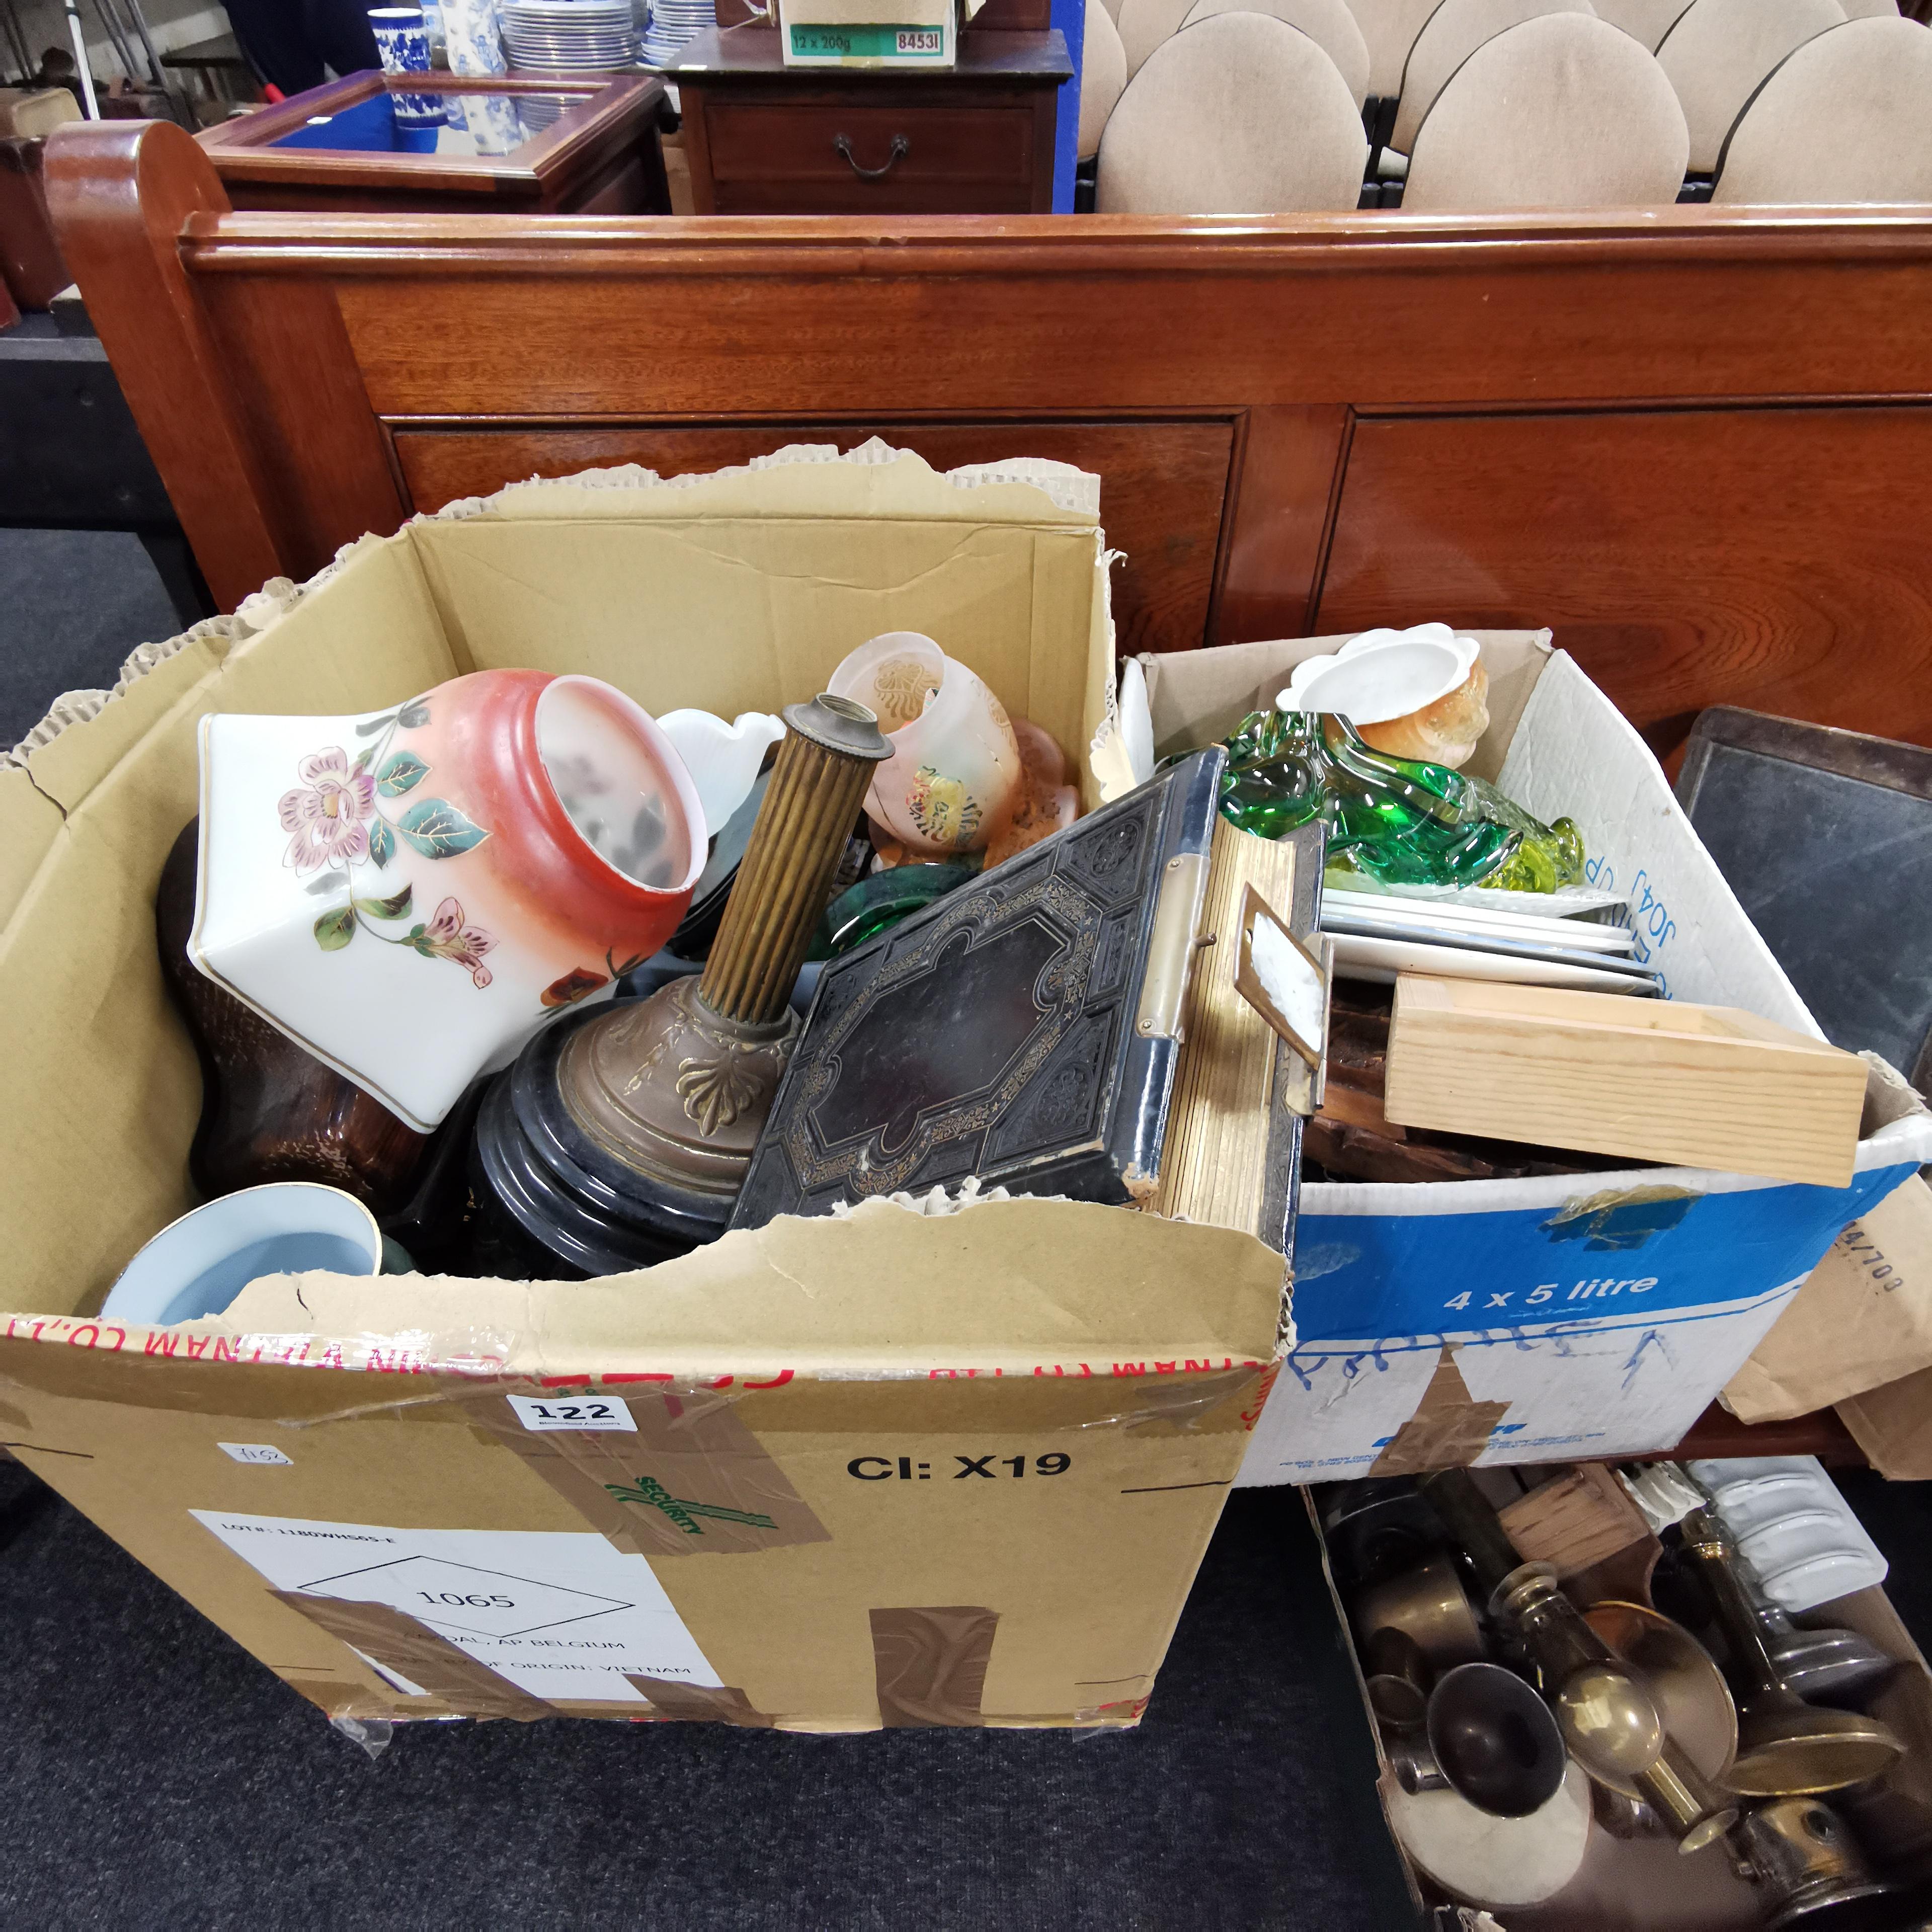 Lot 122 - 2 BOX LOTS OF ORNAMENTS